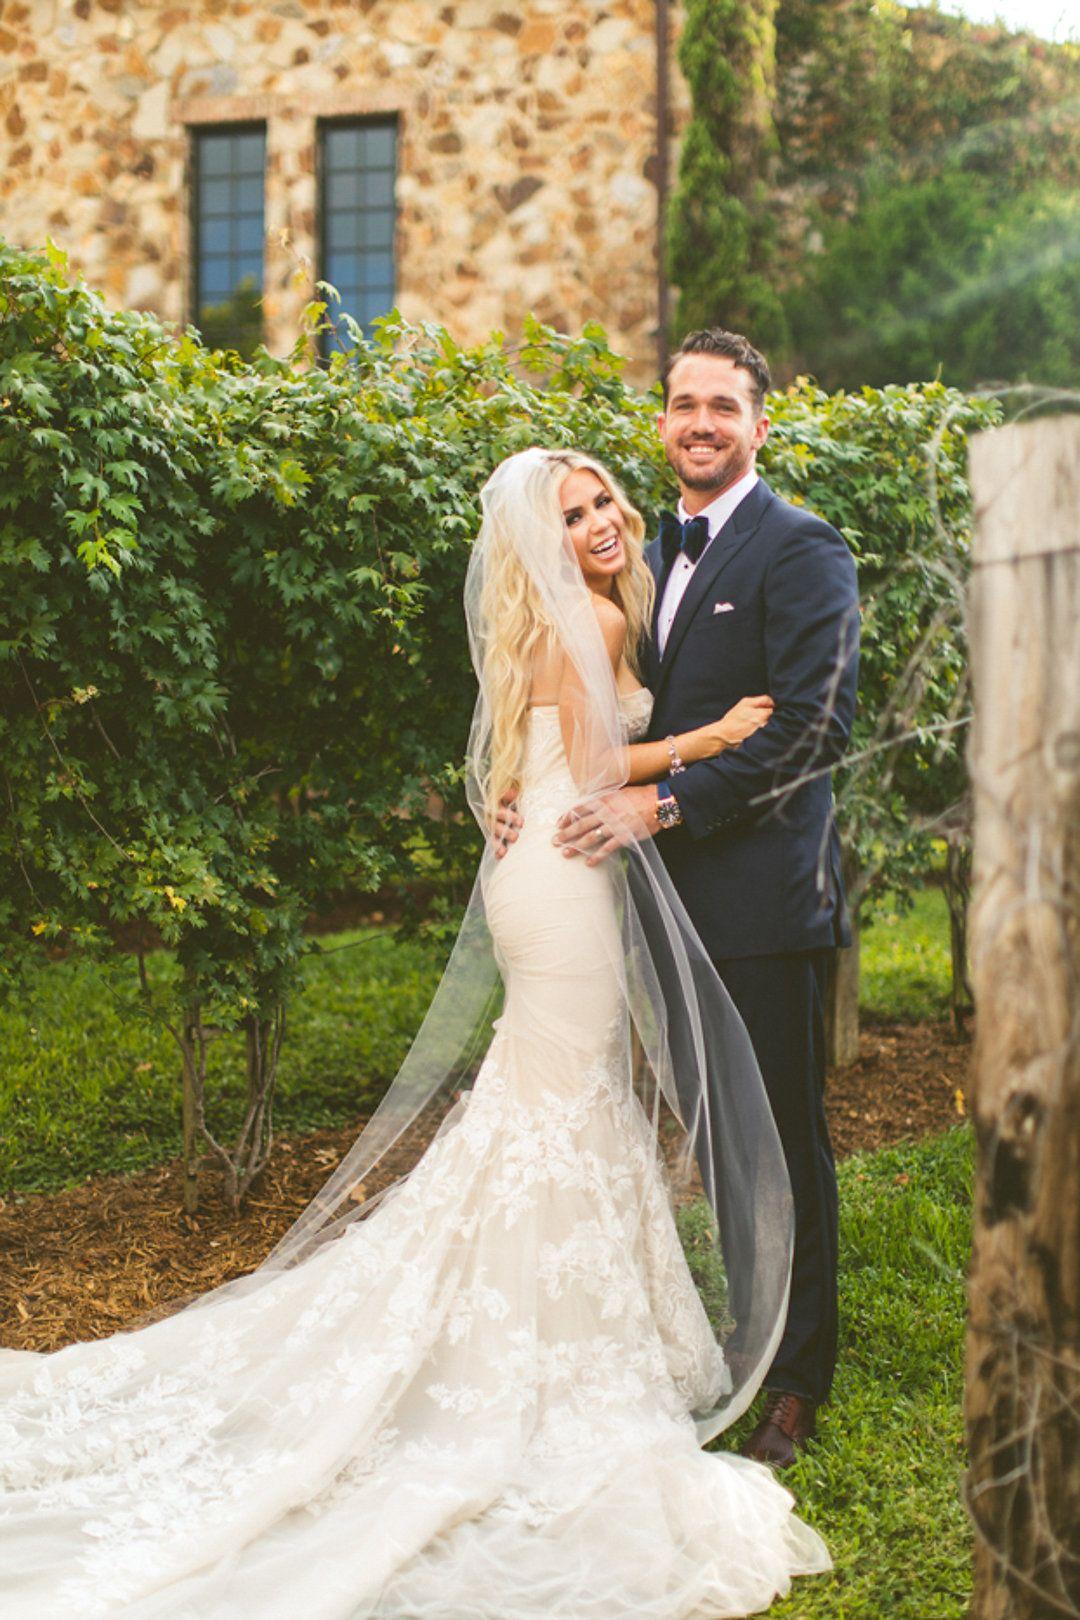 Twilight Rustic Barn Wedding  Hochzeitskleid, Hochzeit